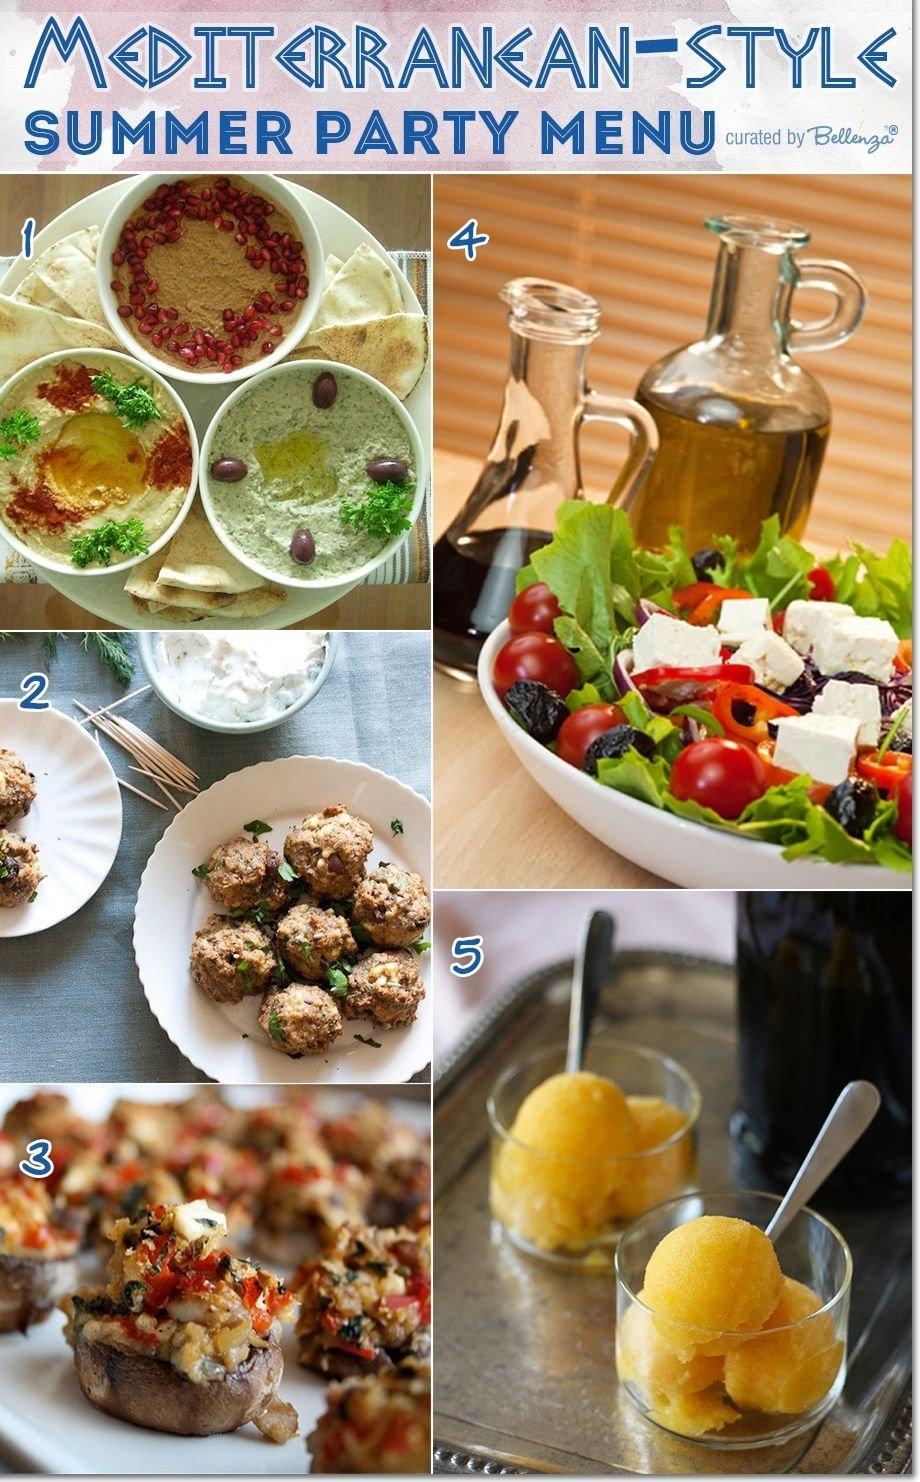 menu ideas for hosting a mediterranean-style summer party! | summer